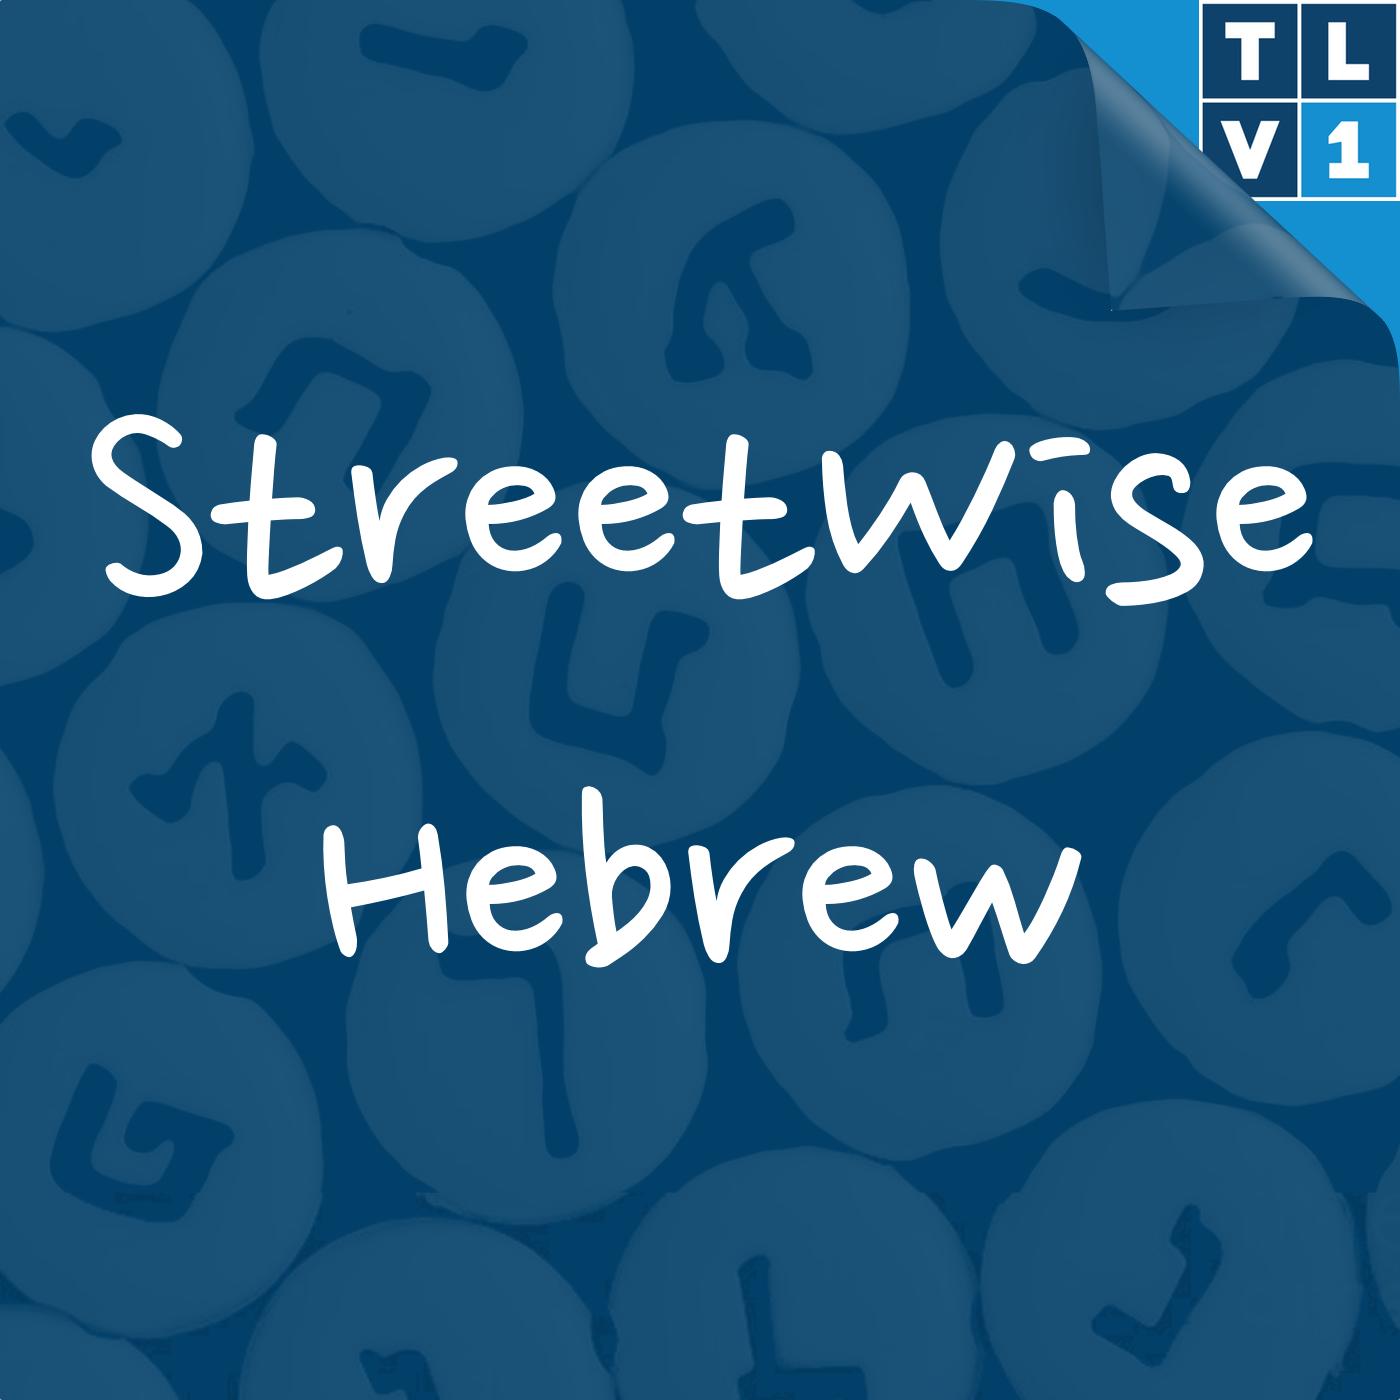 Streetwise Hebrew show art